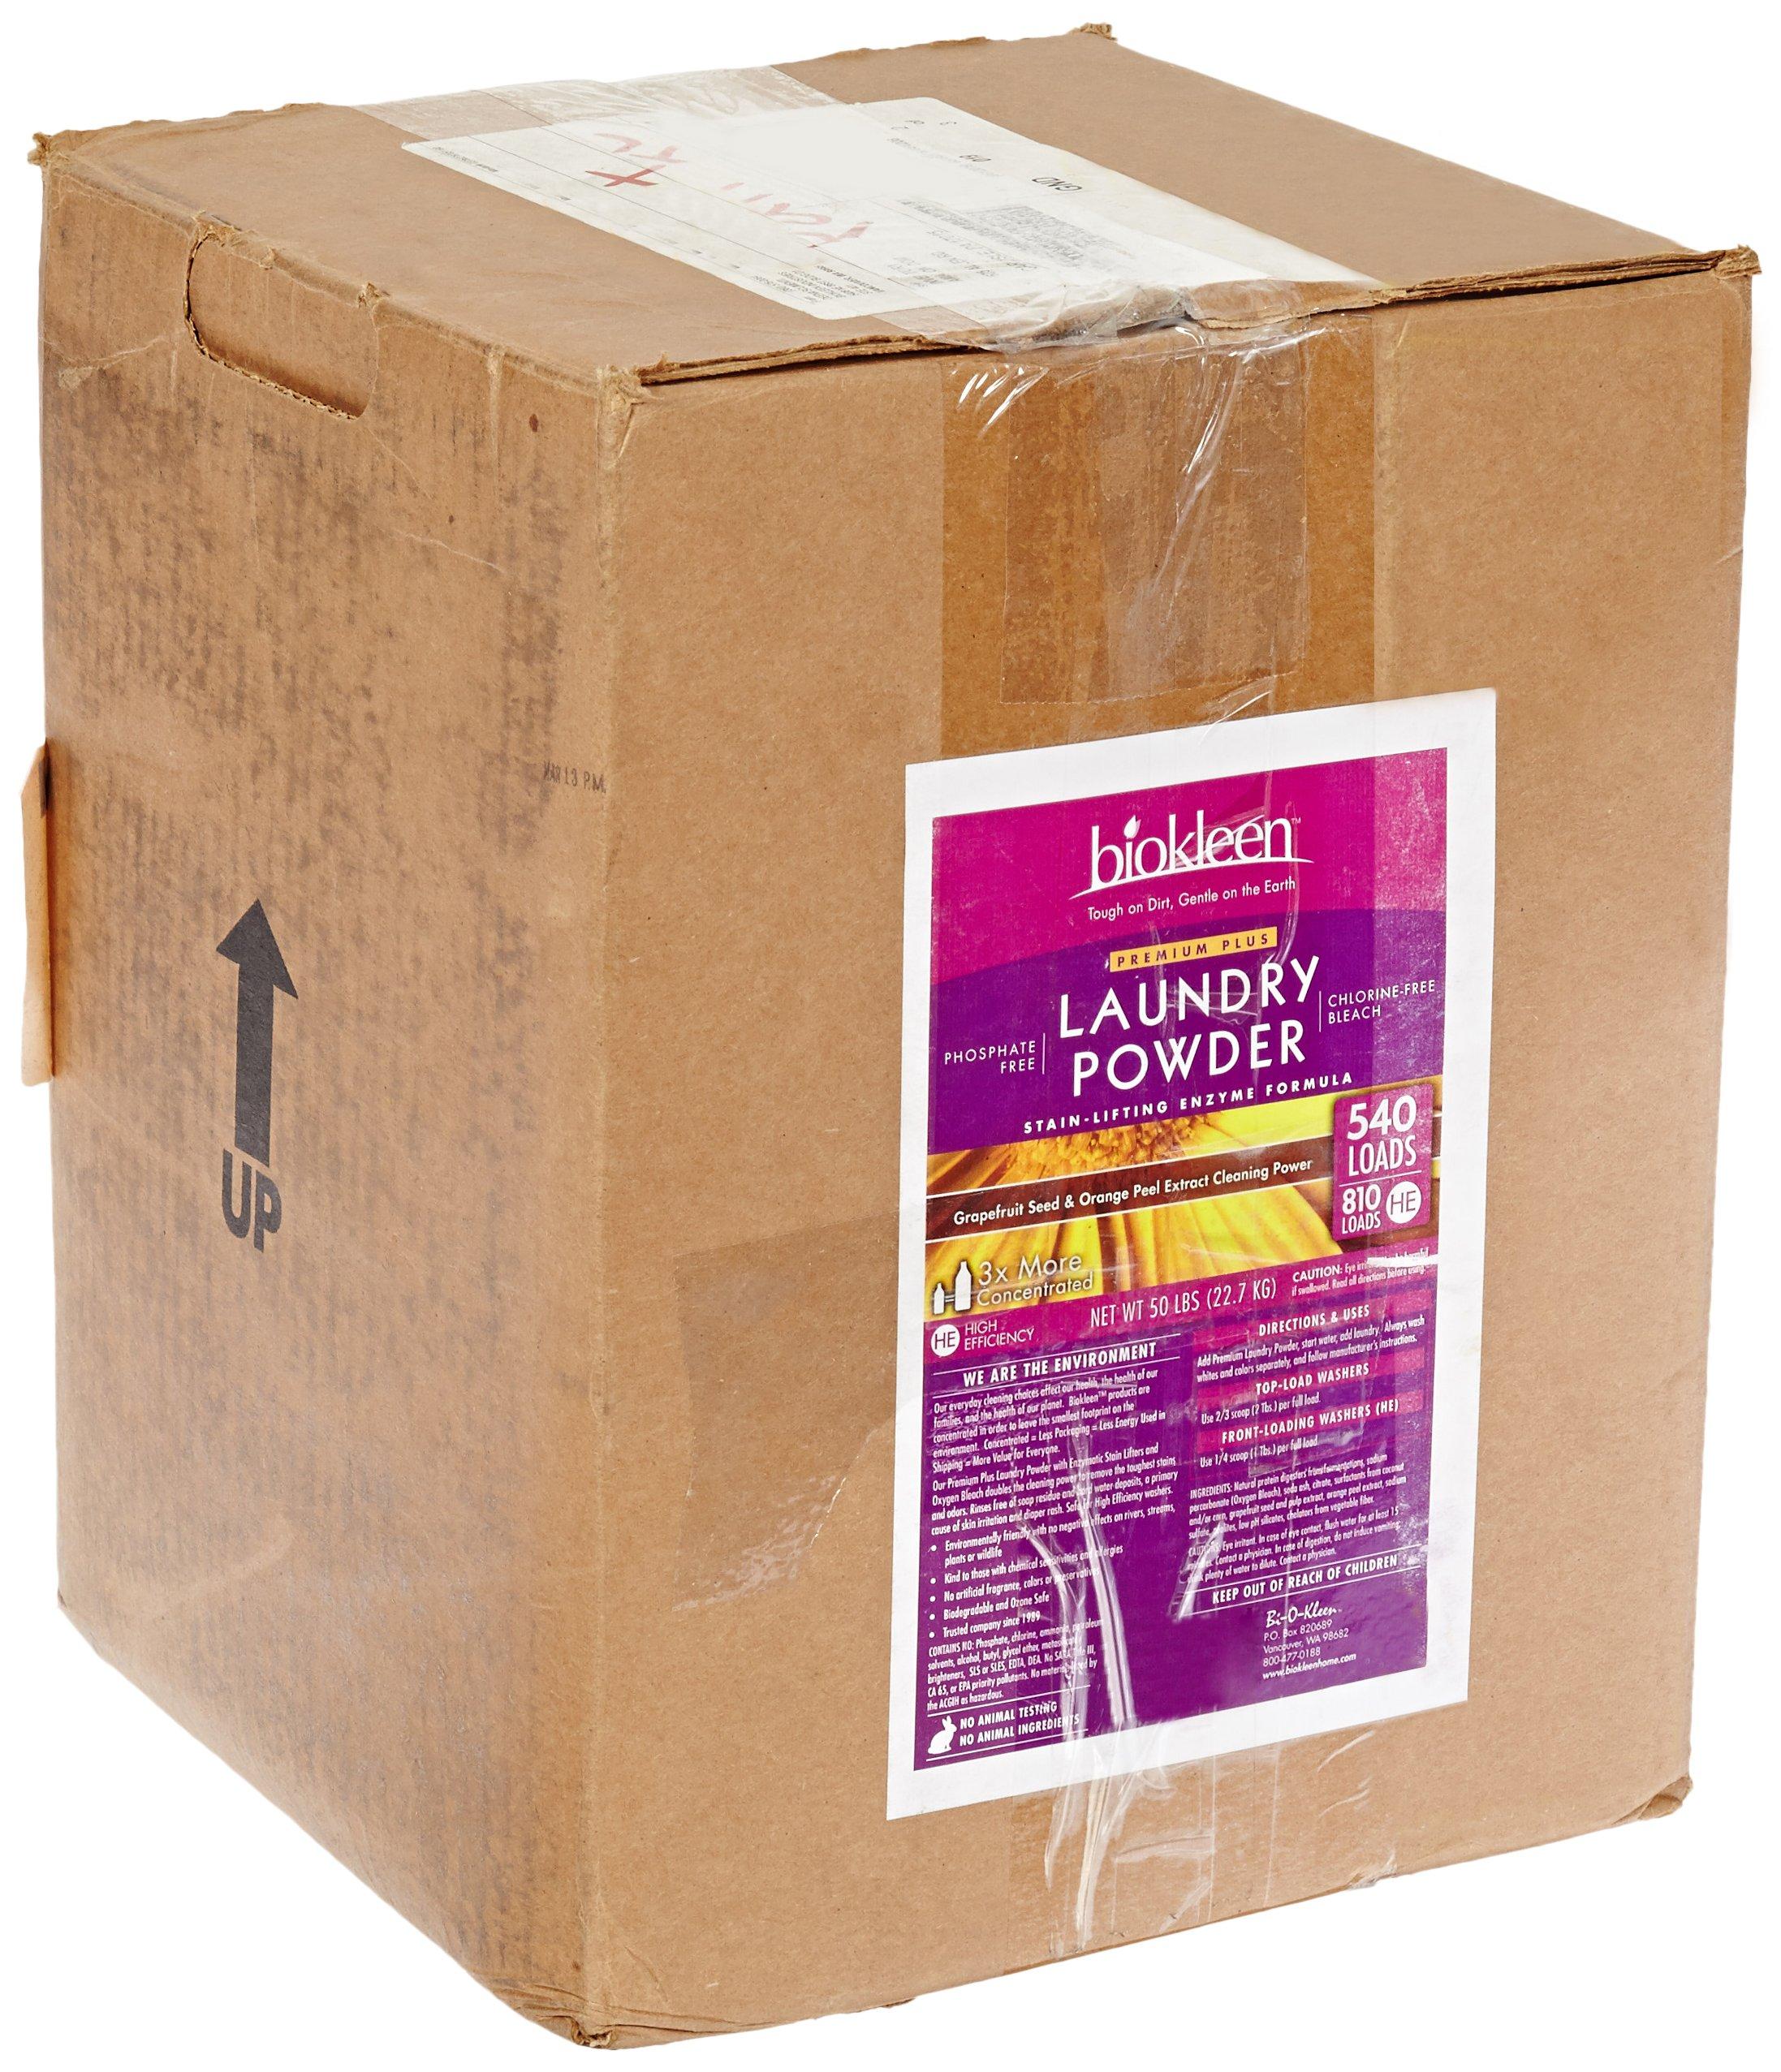 BioKleen 00047 Premium Laundry Powder, 50 lbs Box - 750 HE Loads/500 Standard Loads